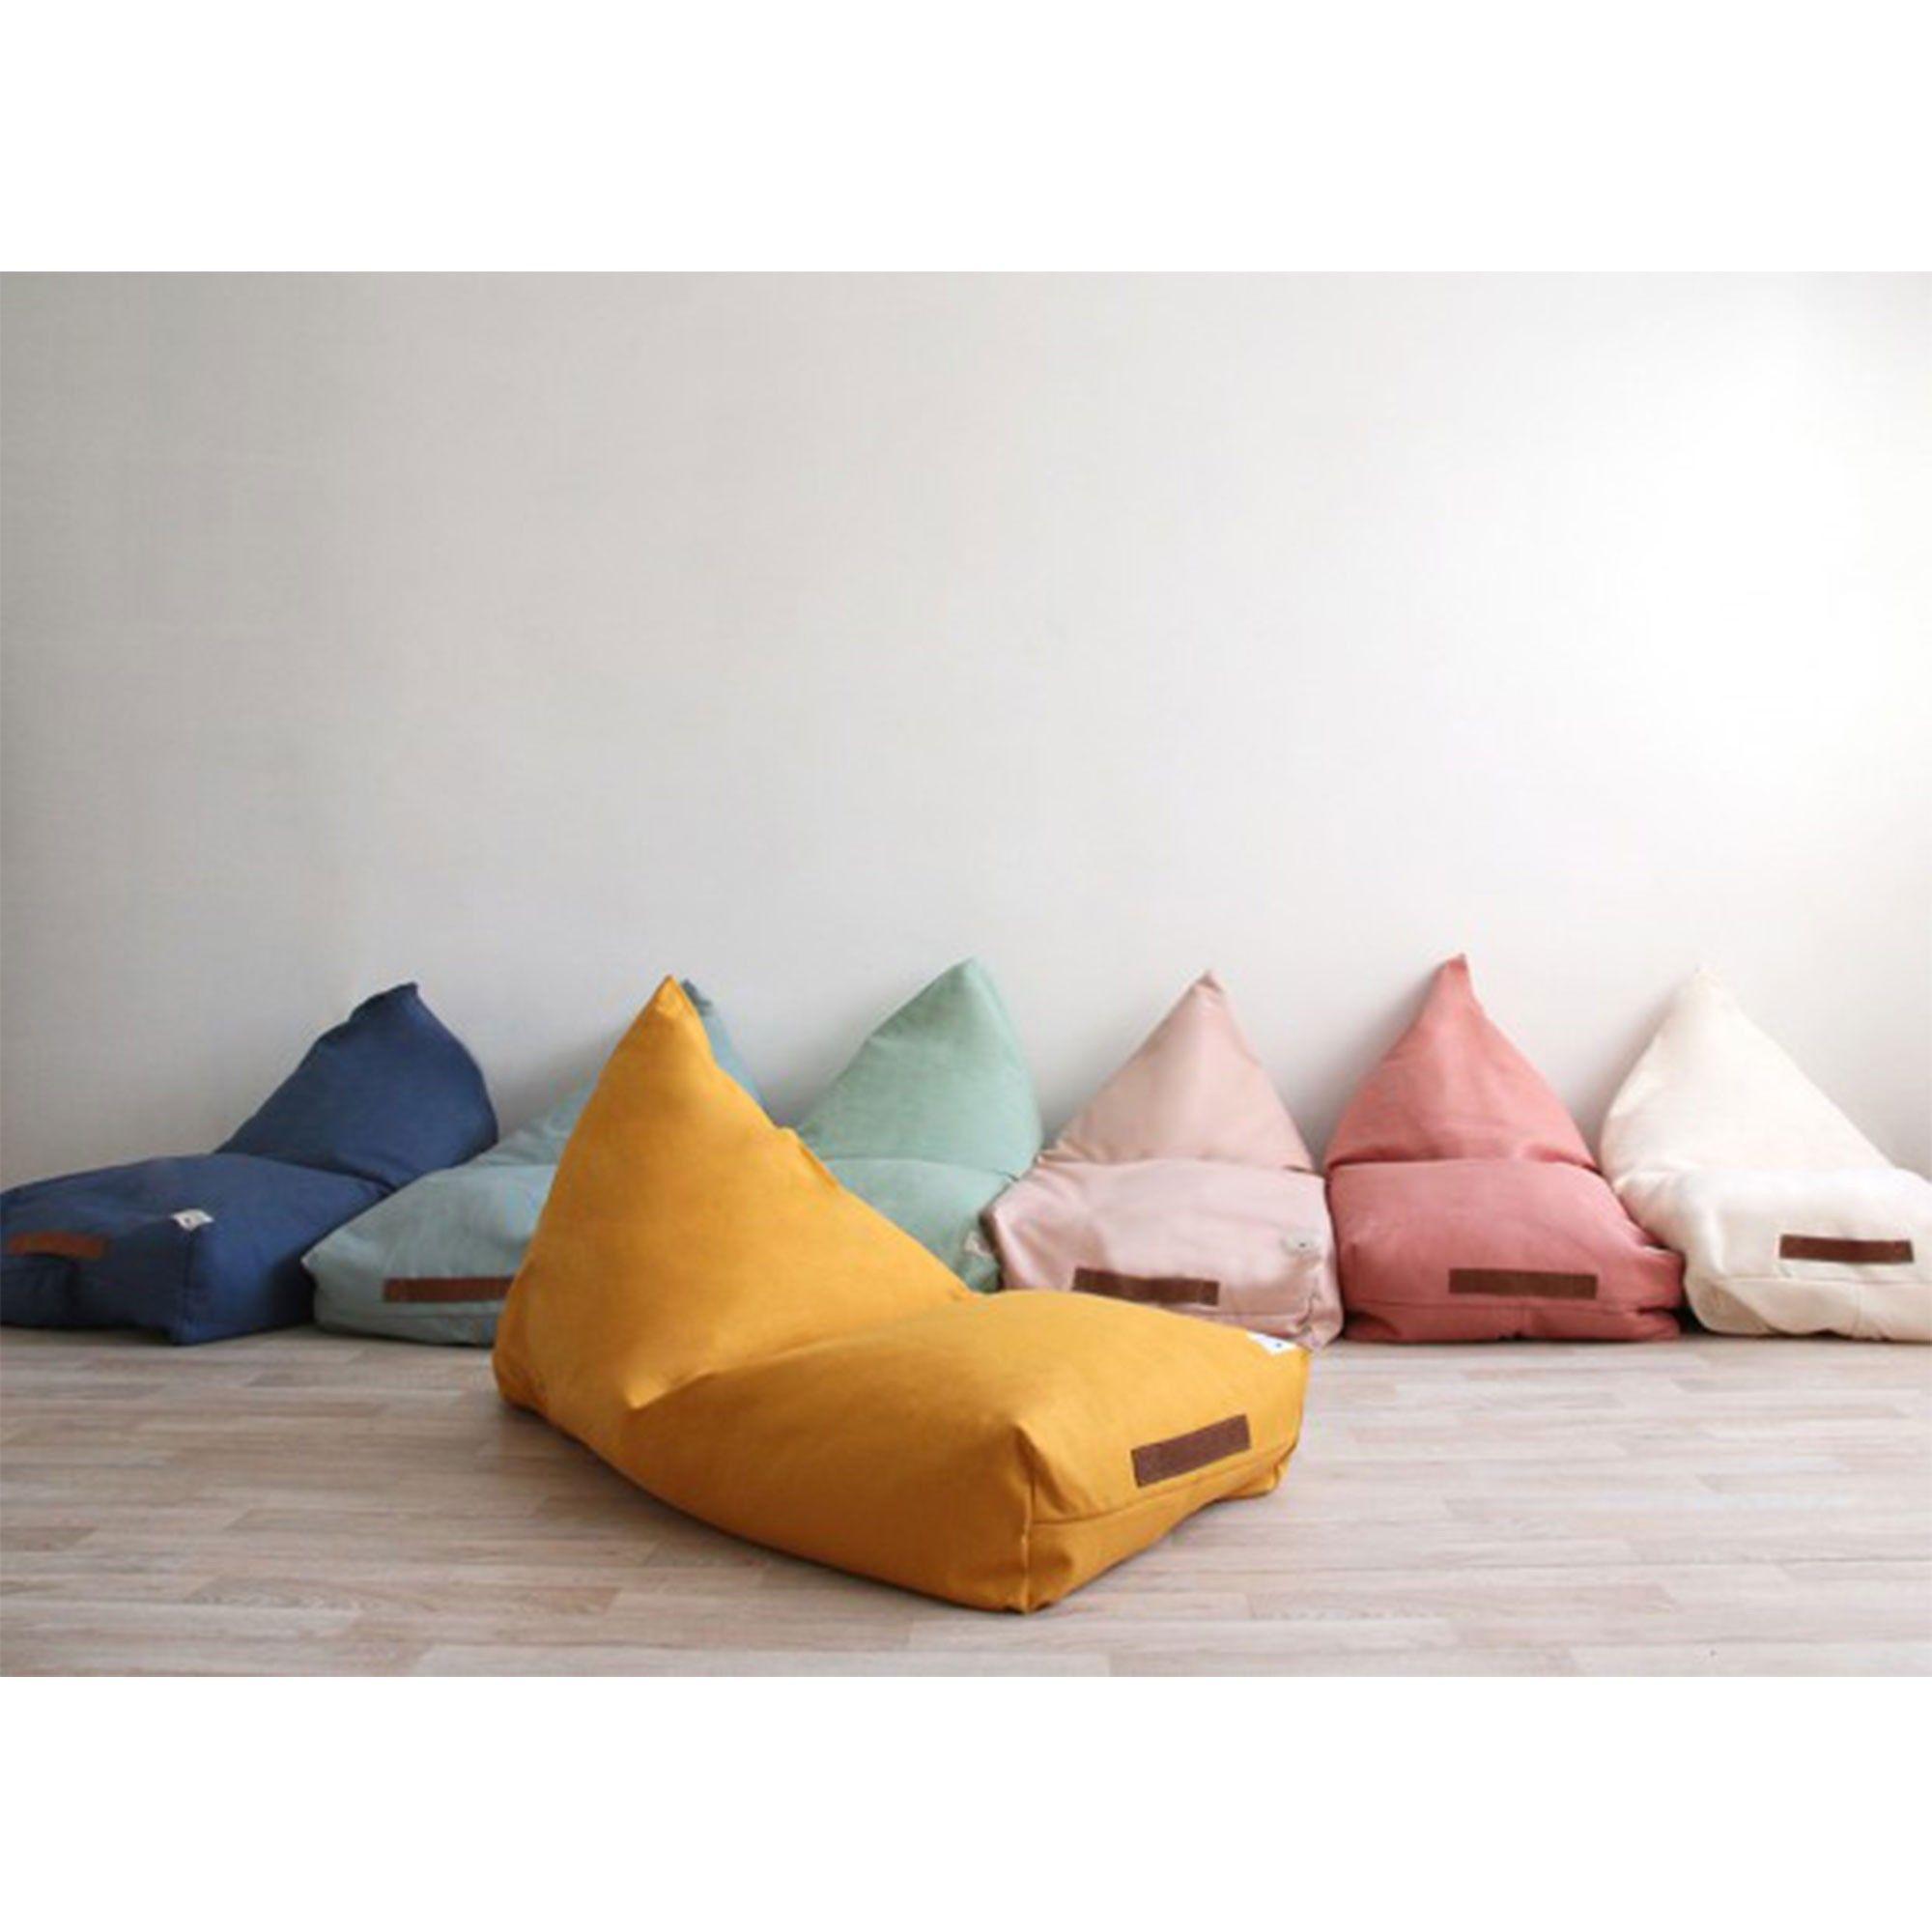 Sitzsäcke Für Kinderzimmer | Sitzsack Baumwolle Llitlehispstar 70 Eur Home